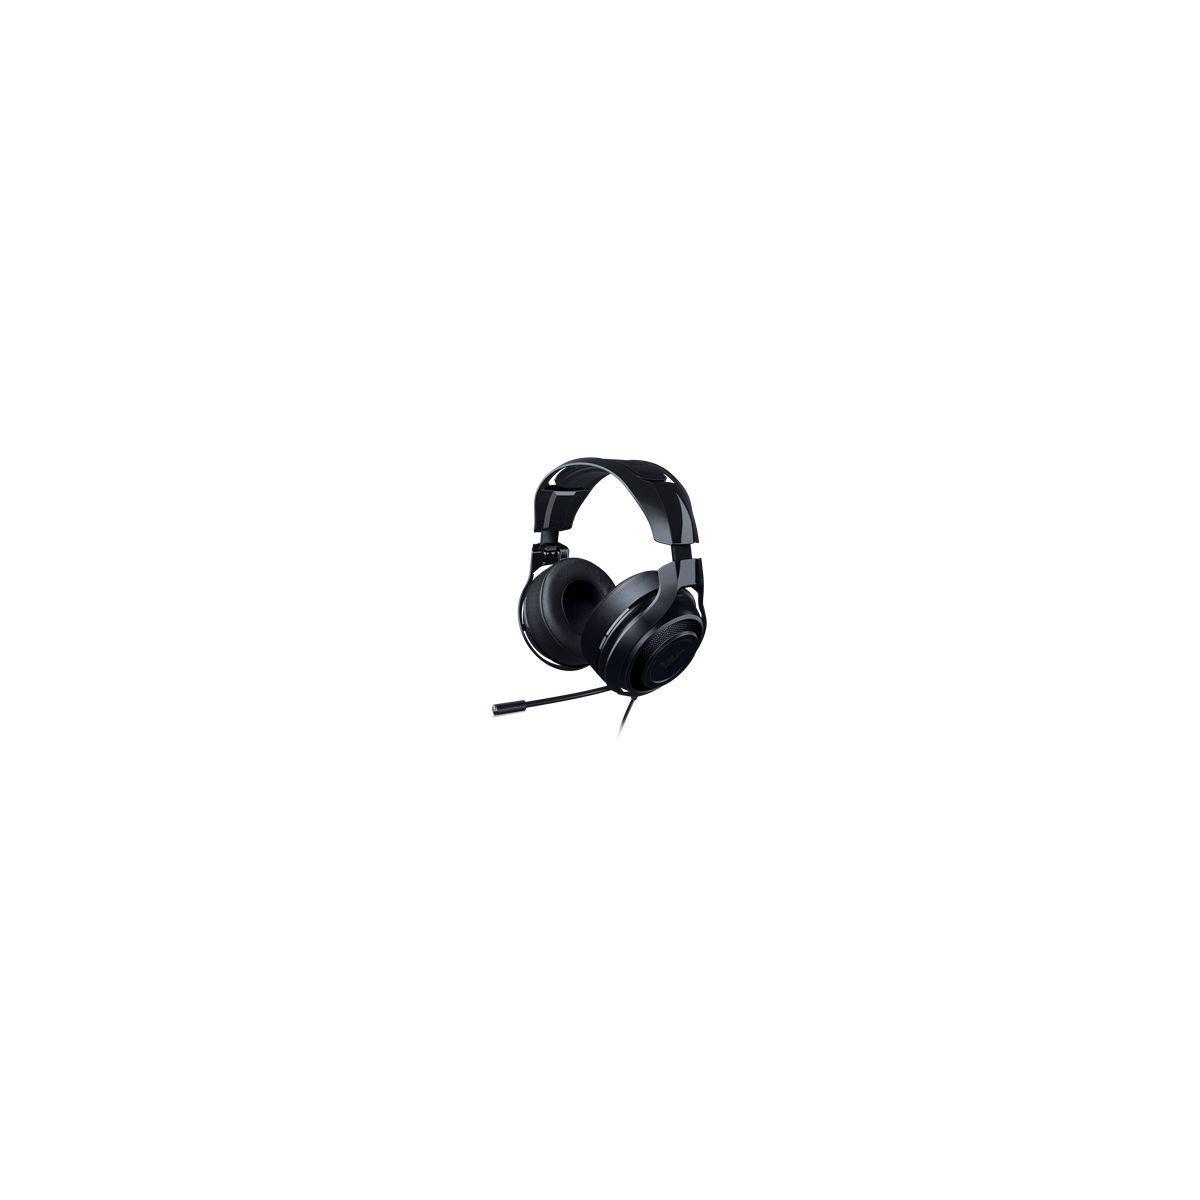 Casque micro razer mano'war 7.1 noir - livraison offerte : code chronoff (photo)